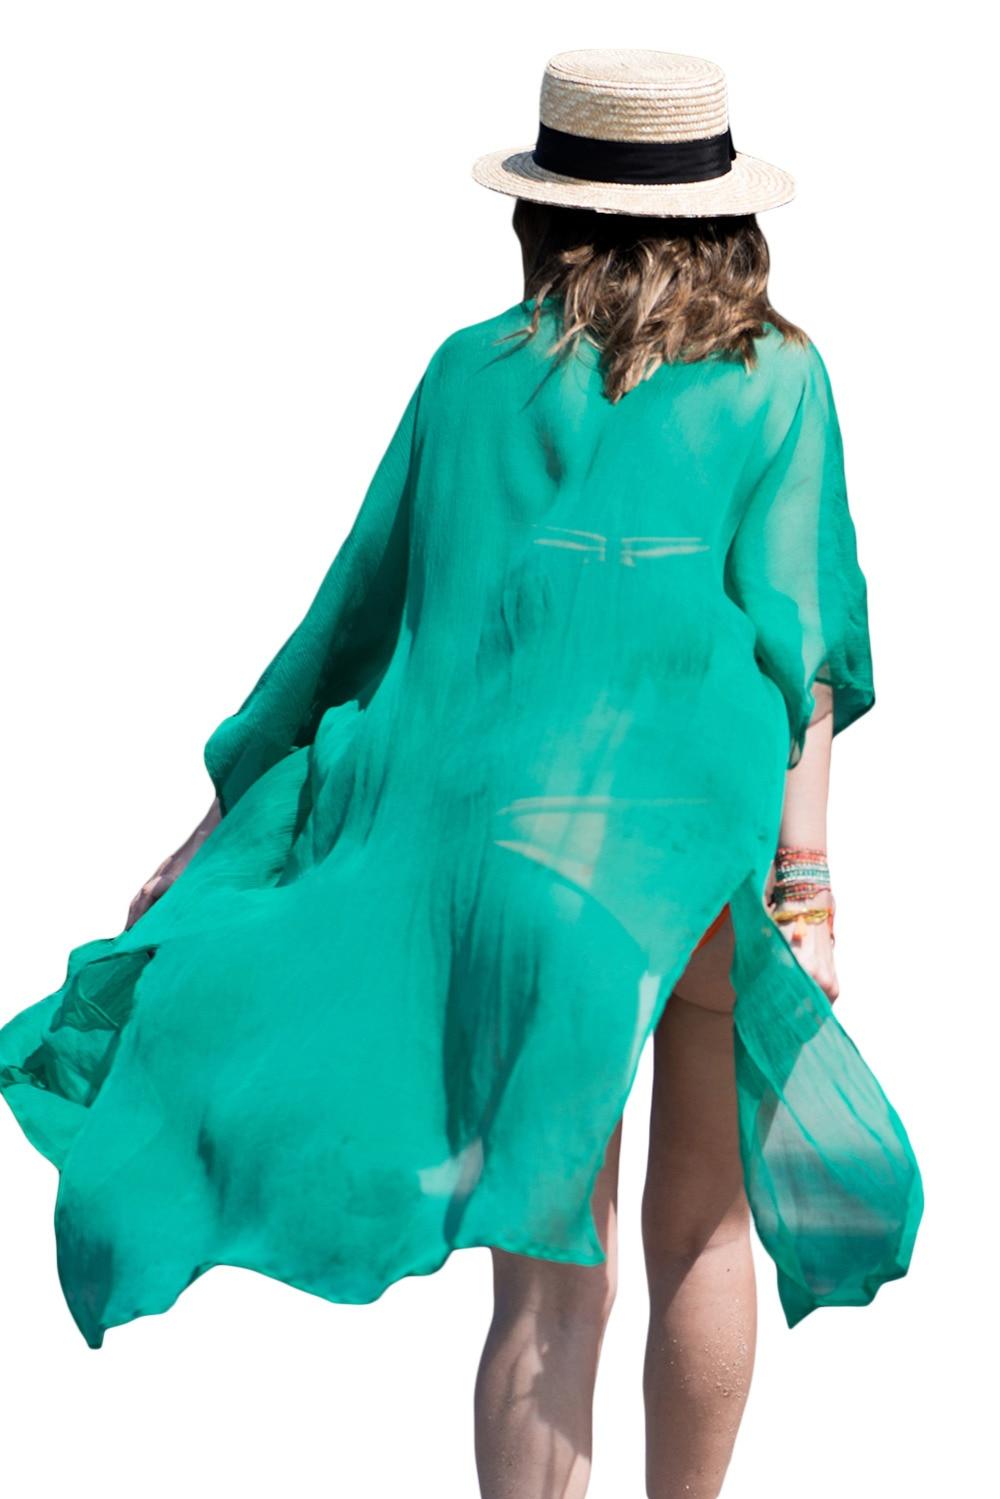 a557272866178 2018 New Sexy Hawaiian Crinkle Sheer Chiffon Long Kaftan Miami Beach Dress  Bathing Suit Cover Ups Tunic Beach Pareo Sexy 42111